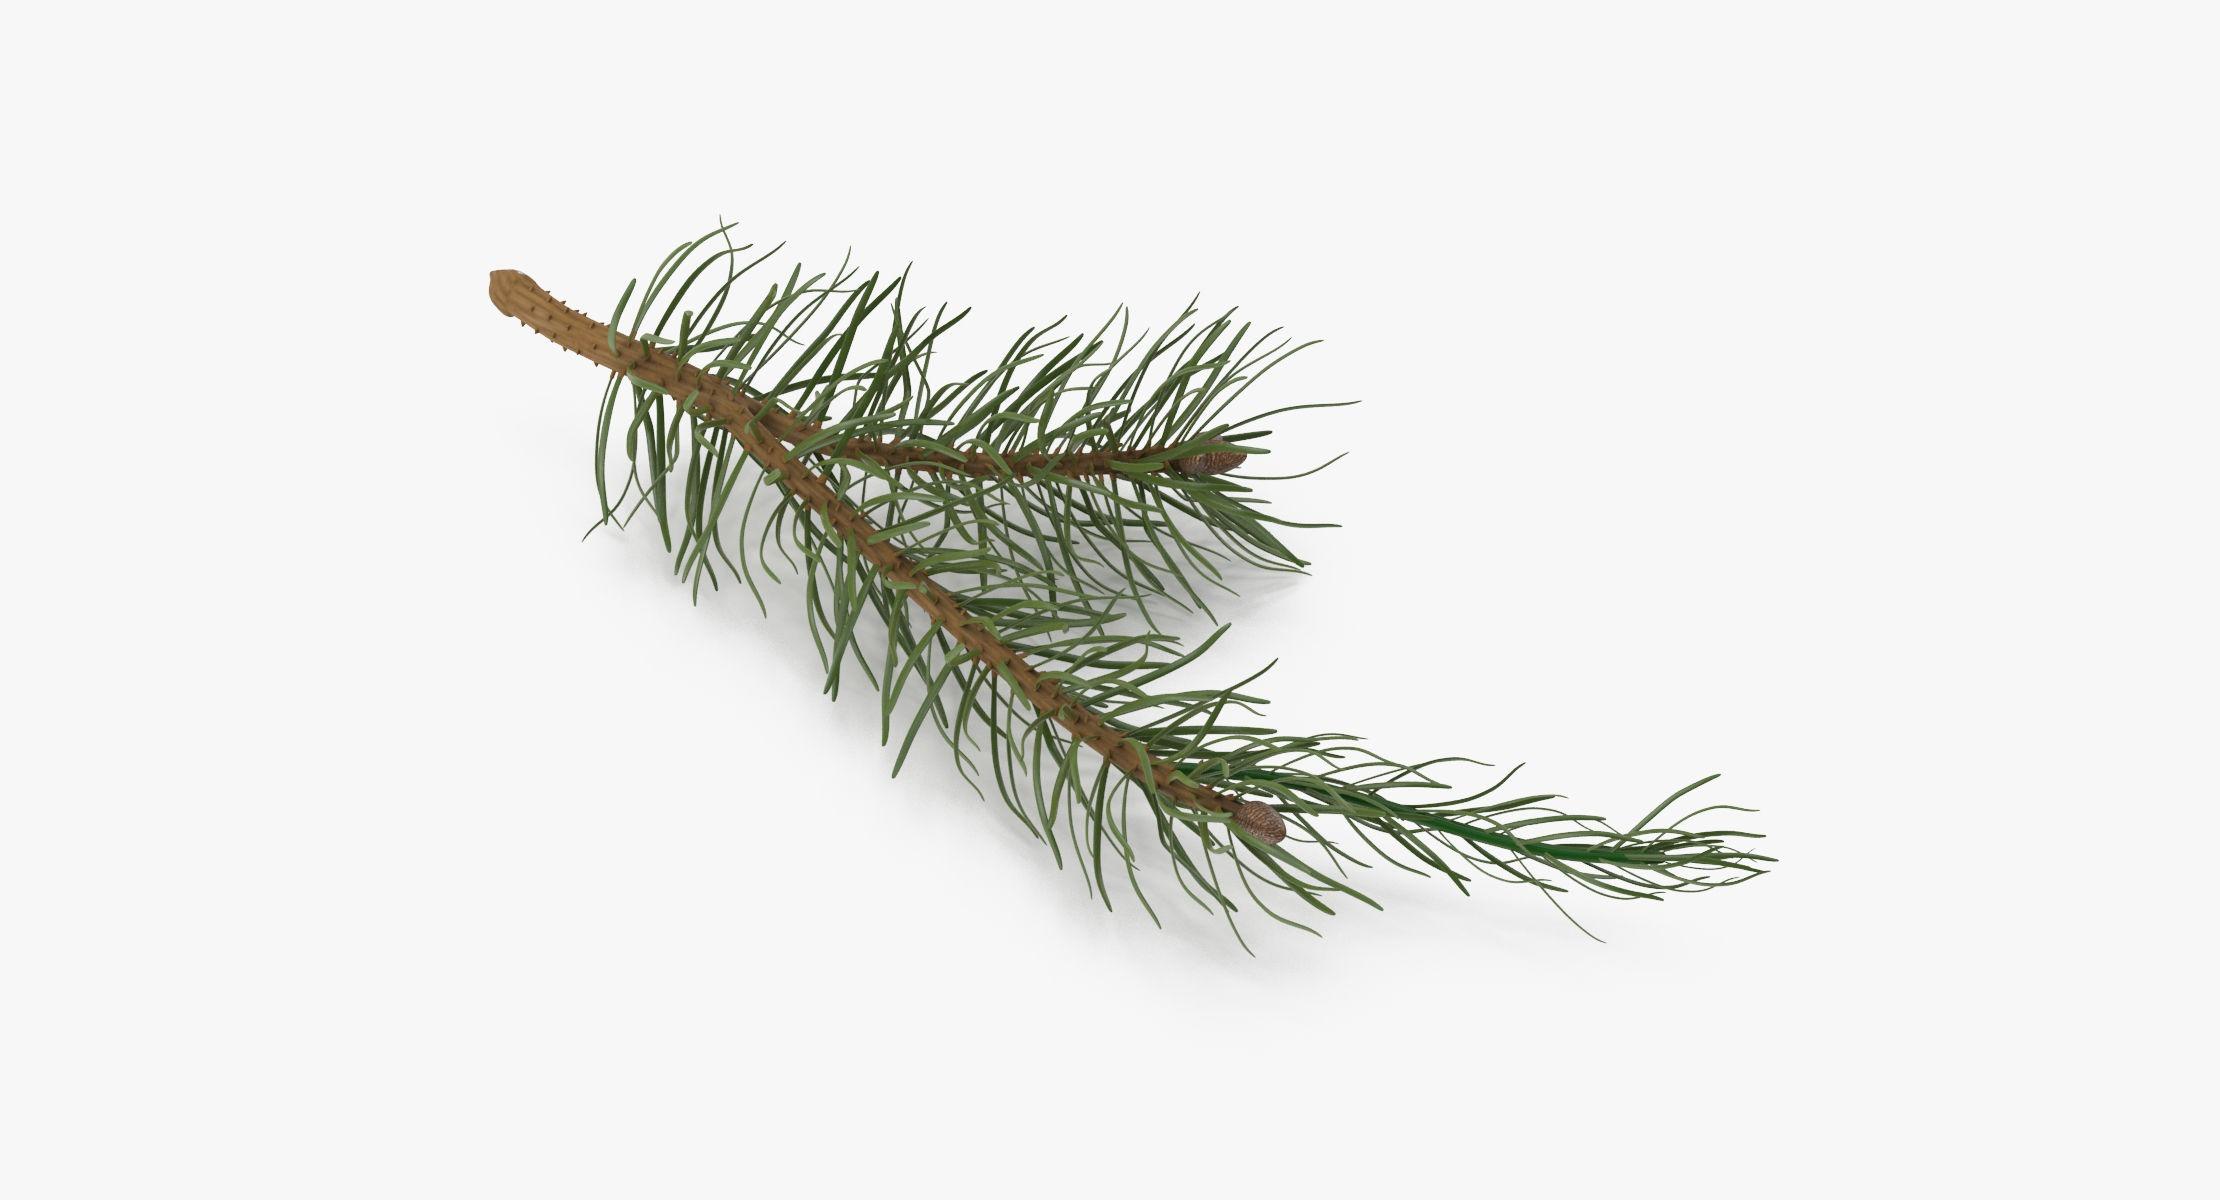 Pine Tree Sprigs 03 - reel 1